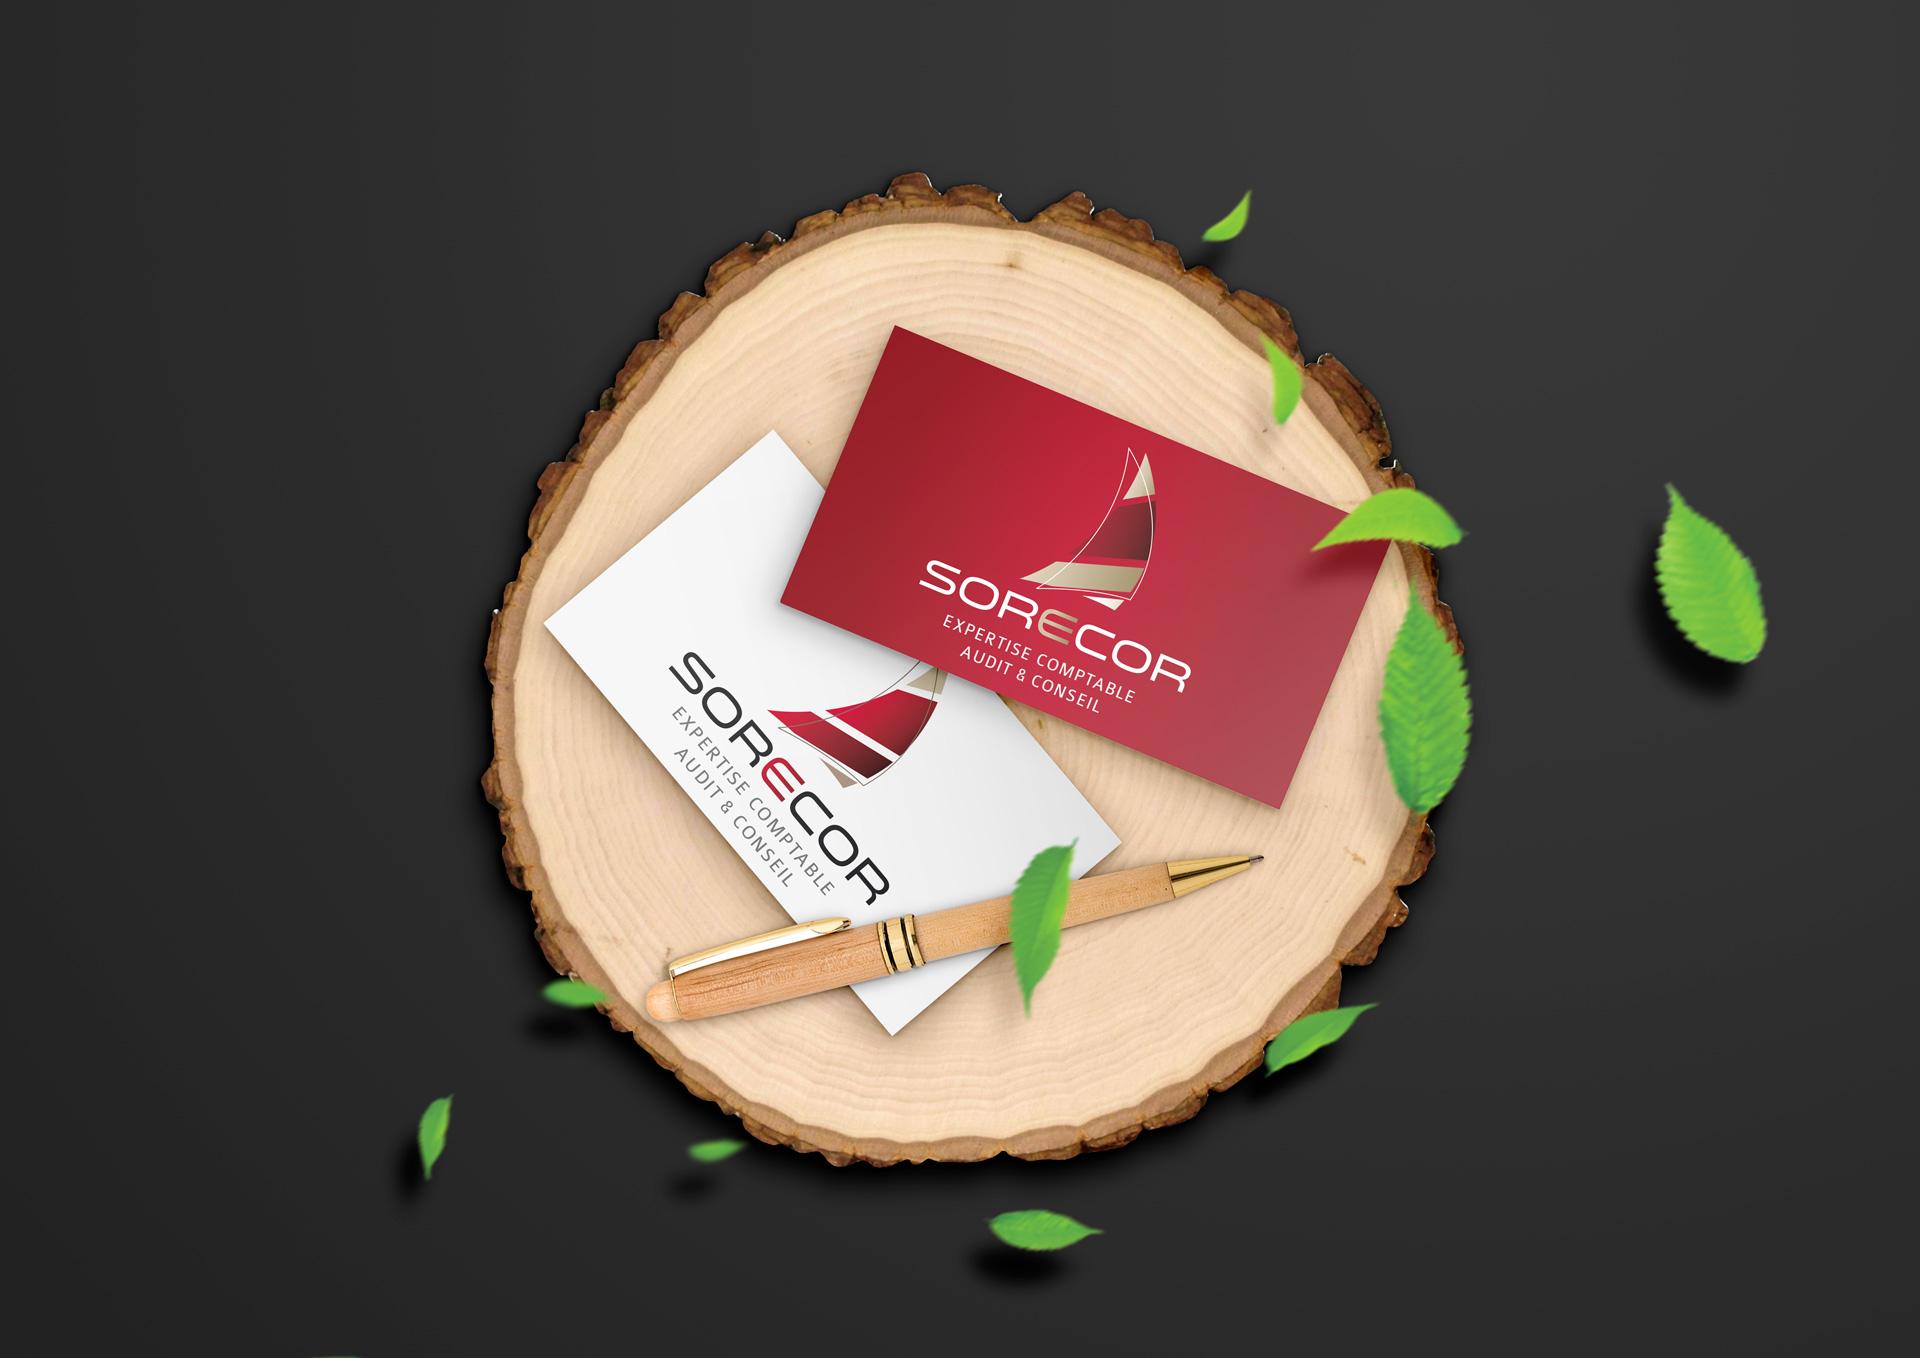 sorecor-cabinet-comptable-logo-coqueliko